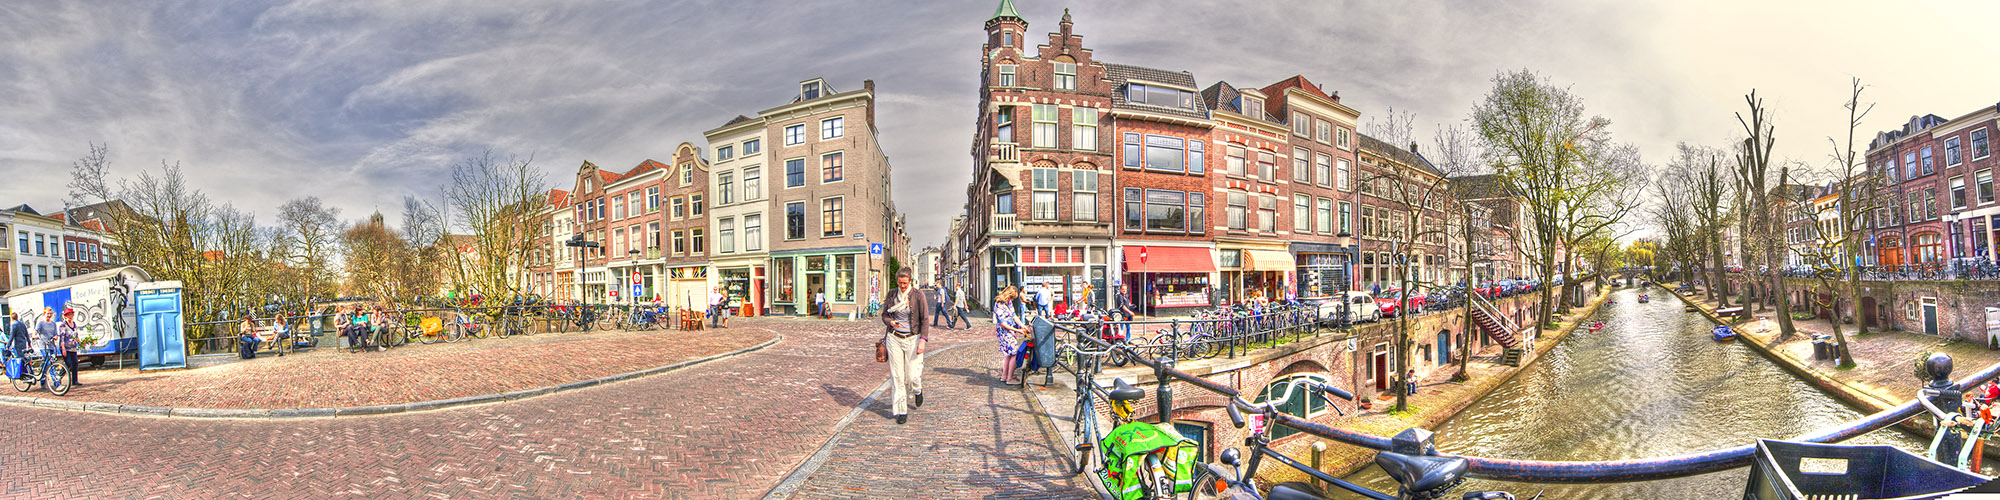 Utrecht fx Panorama HDR 2 08